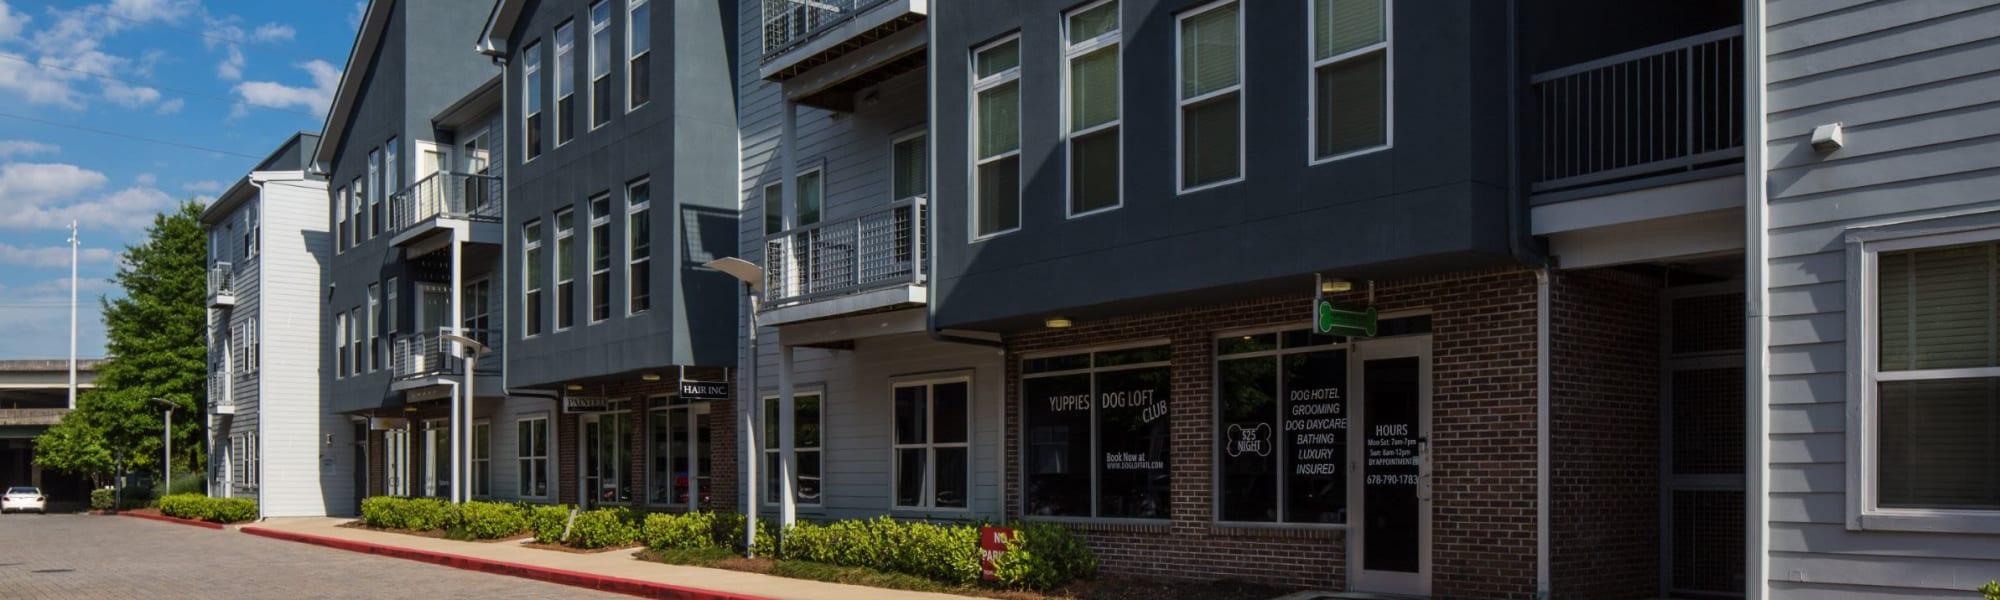 Schedule your tour of Optimist Lofts in Atlanta, Georgia